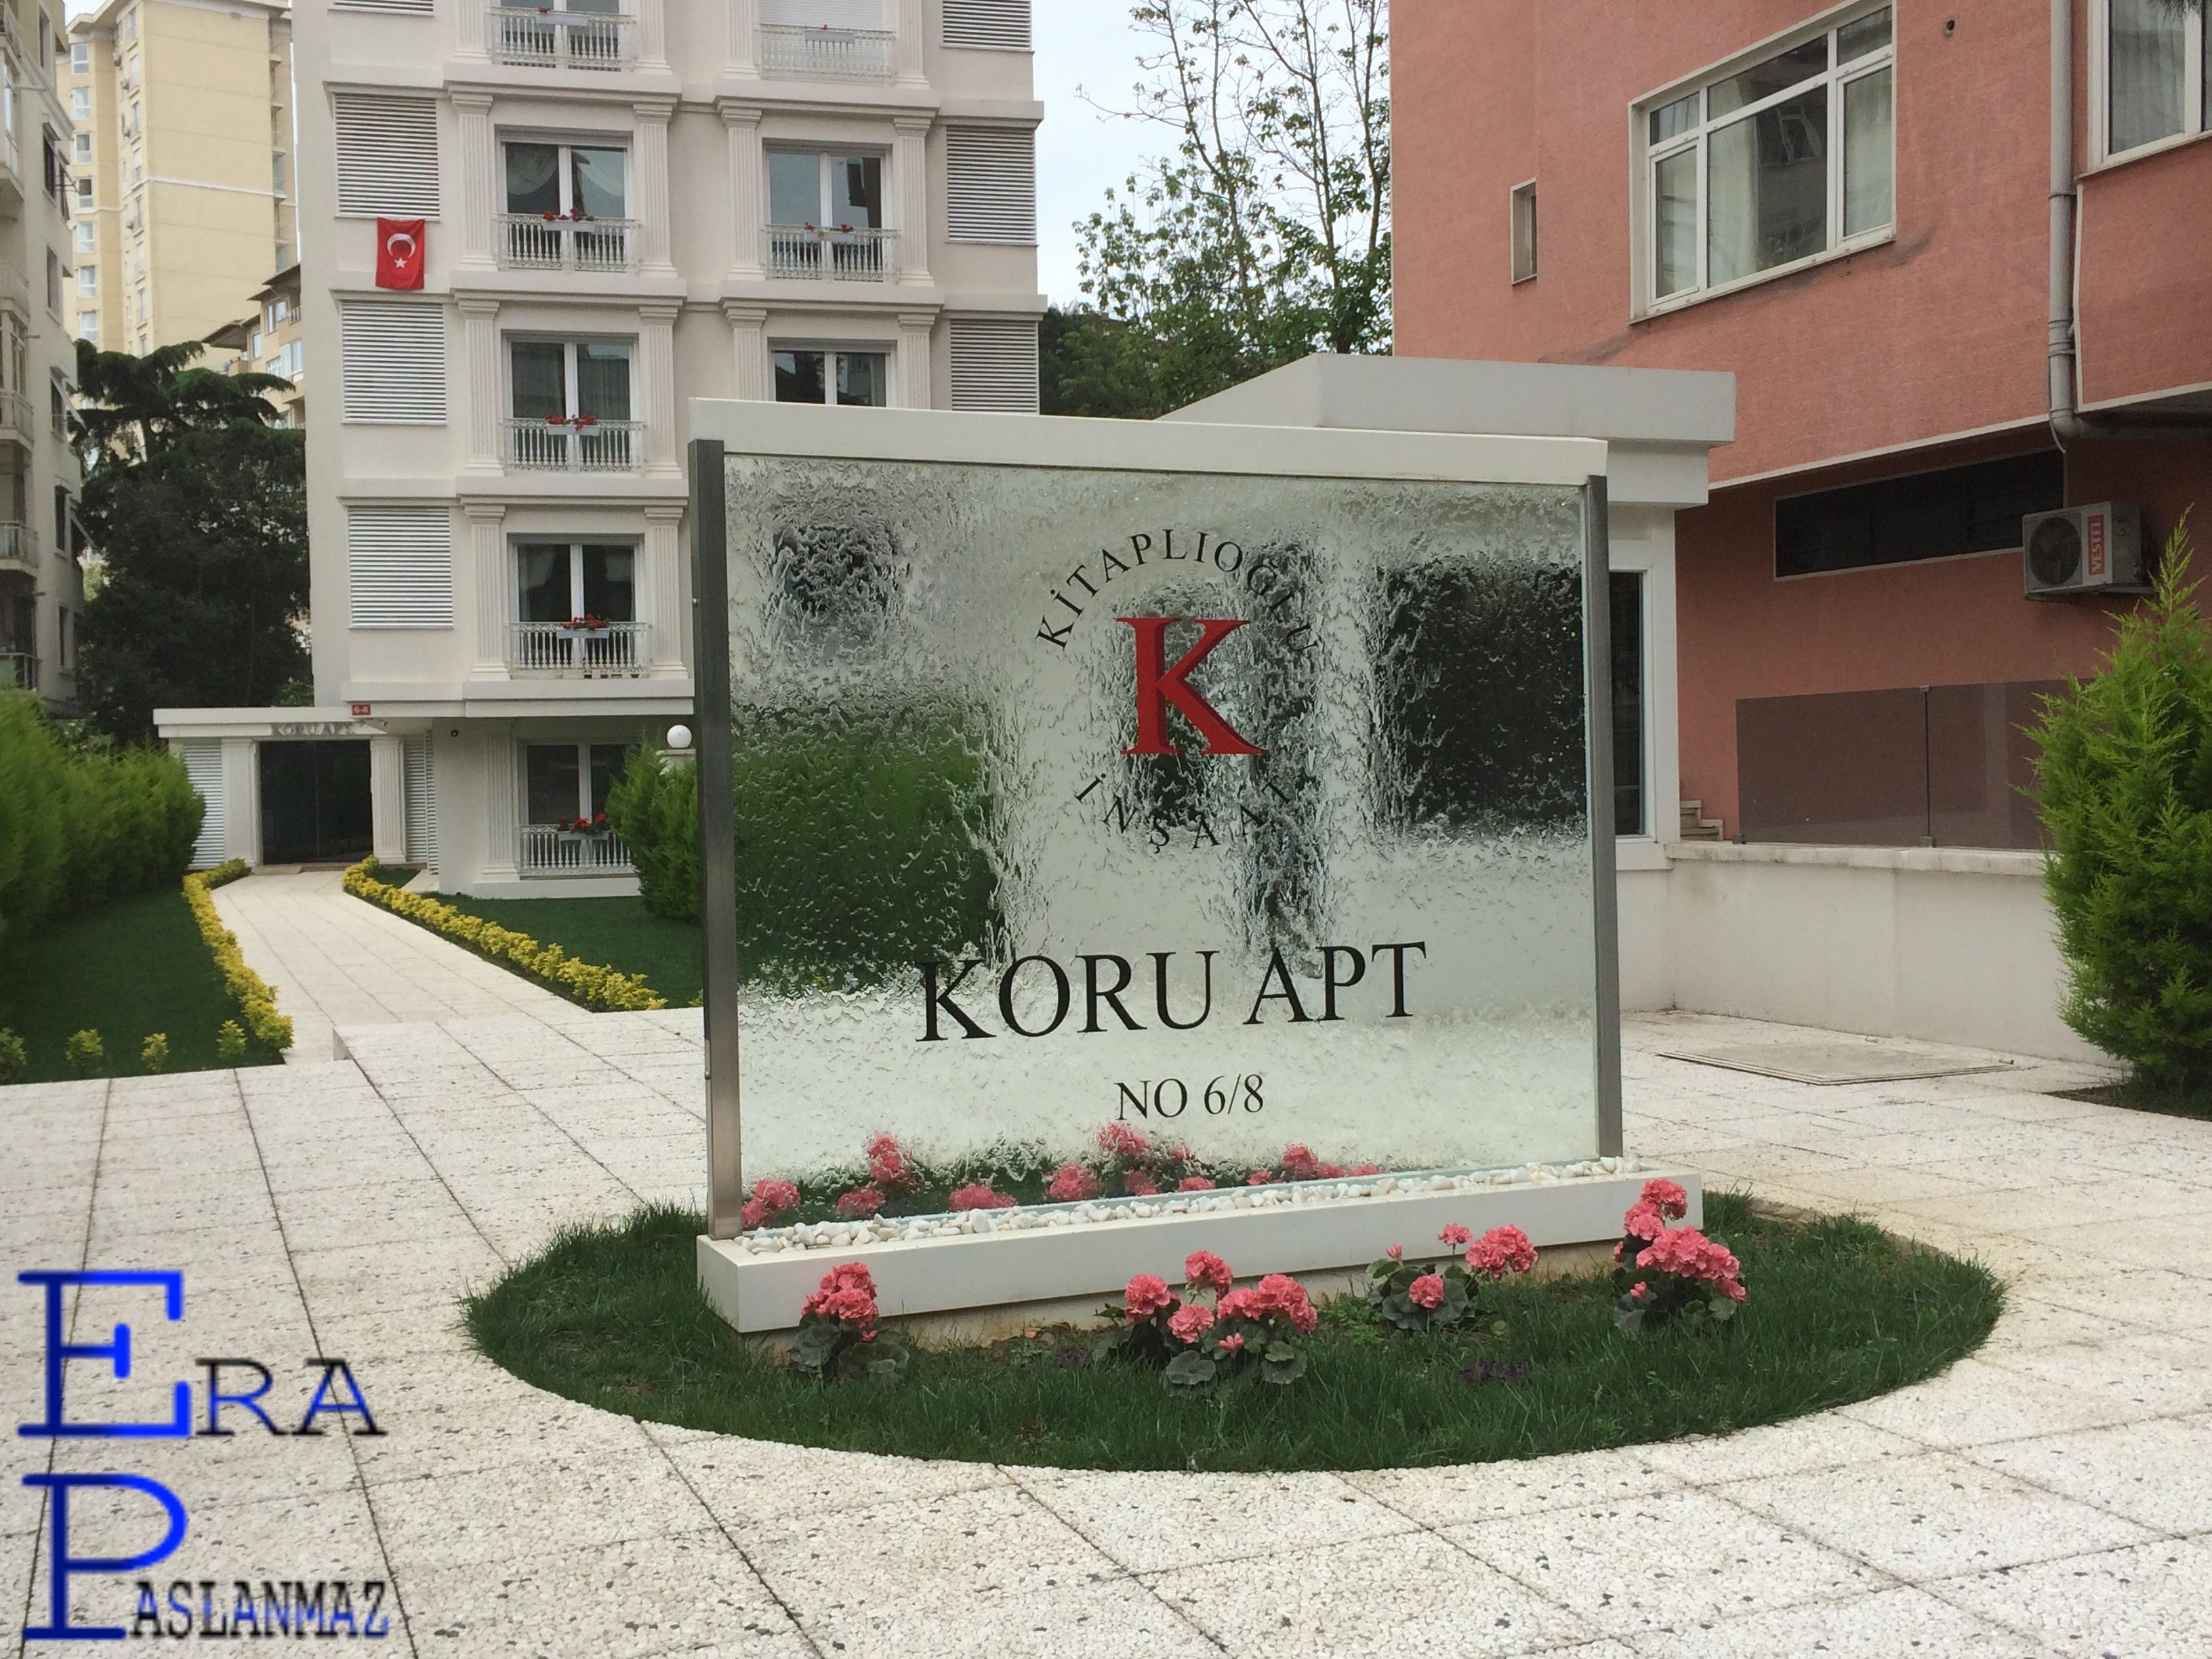 PORTATİF SU PERDESİ